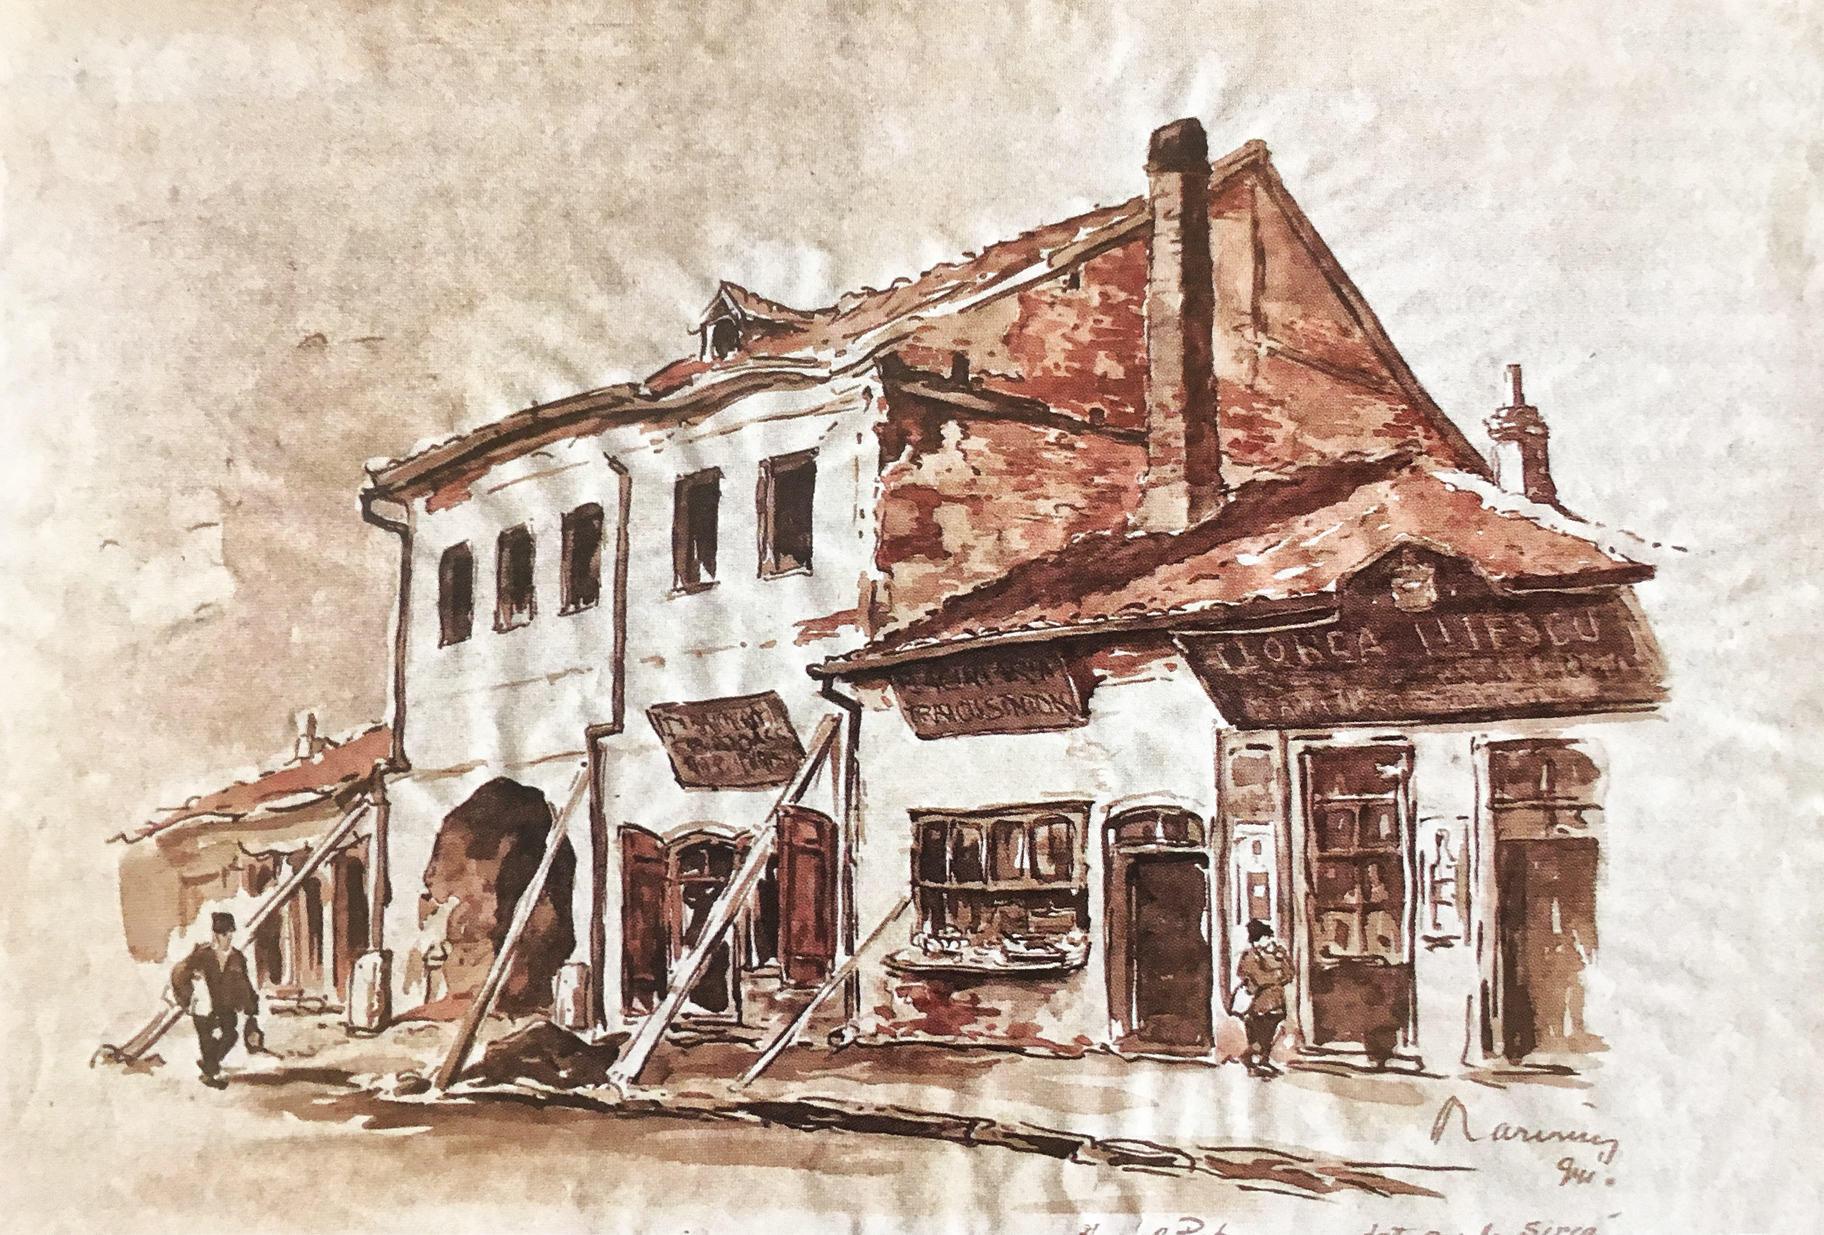 https://ahe-ro.s3.amazonaws.com/2021/rsz_extras_craiova-orasul_celor_o_mie_de_milionari_istoria_craiovei_intre_1800-2000_-_paul_rezeanu_2017_2.jpg